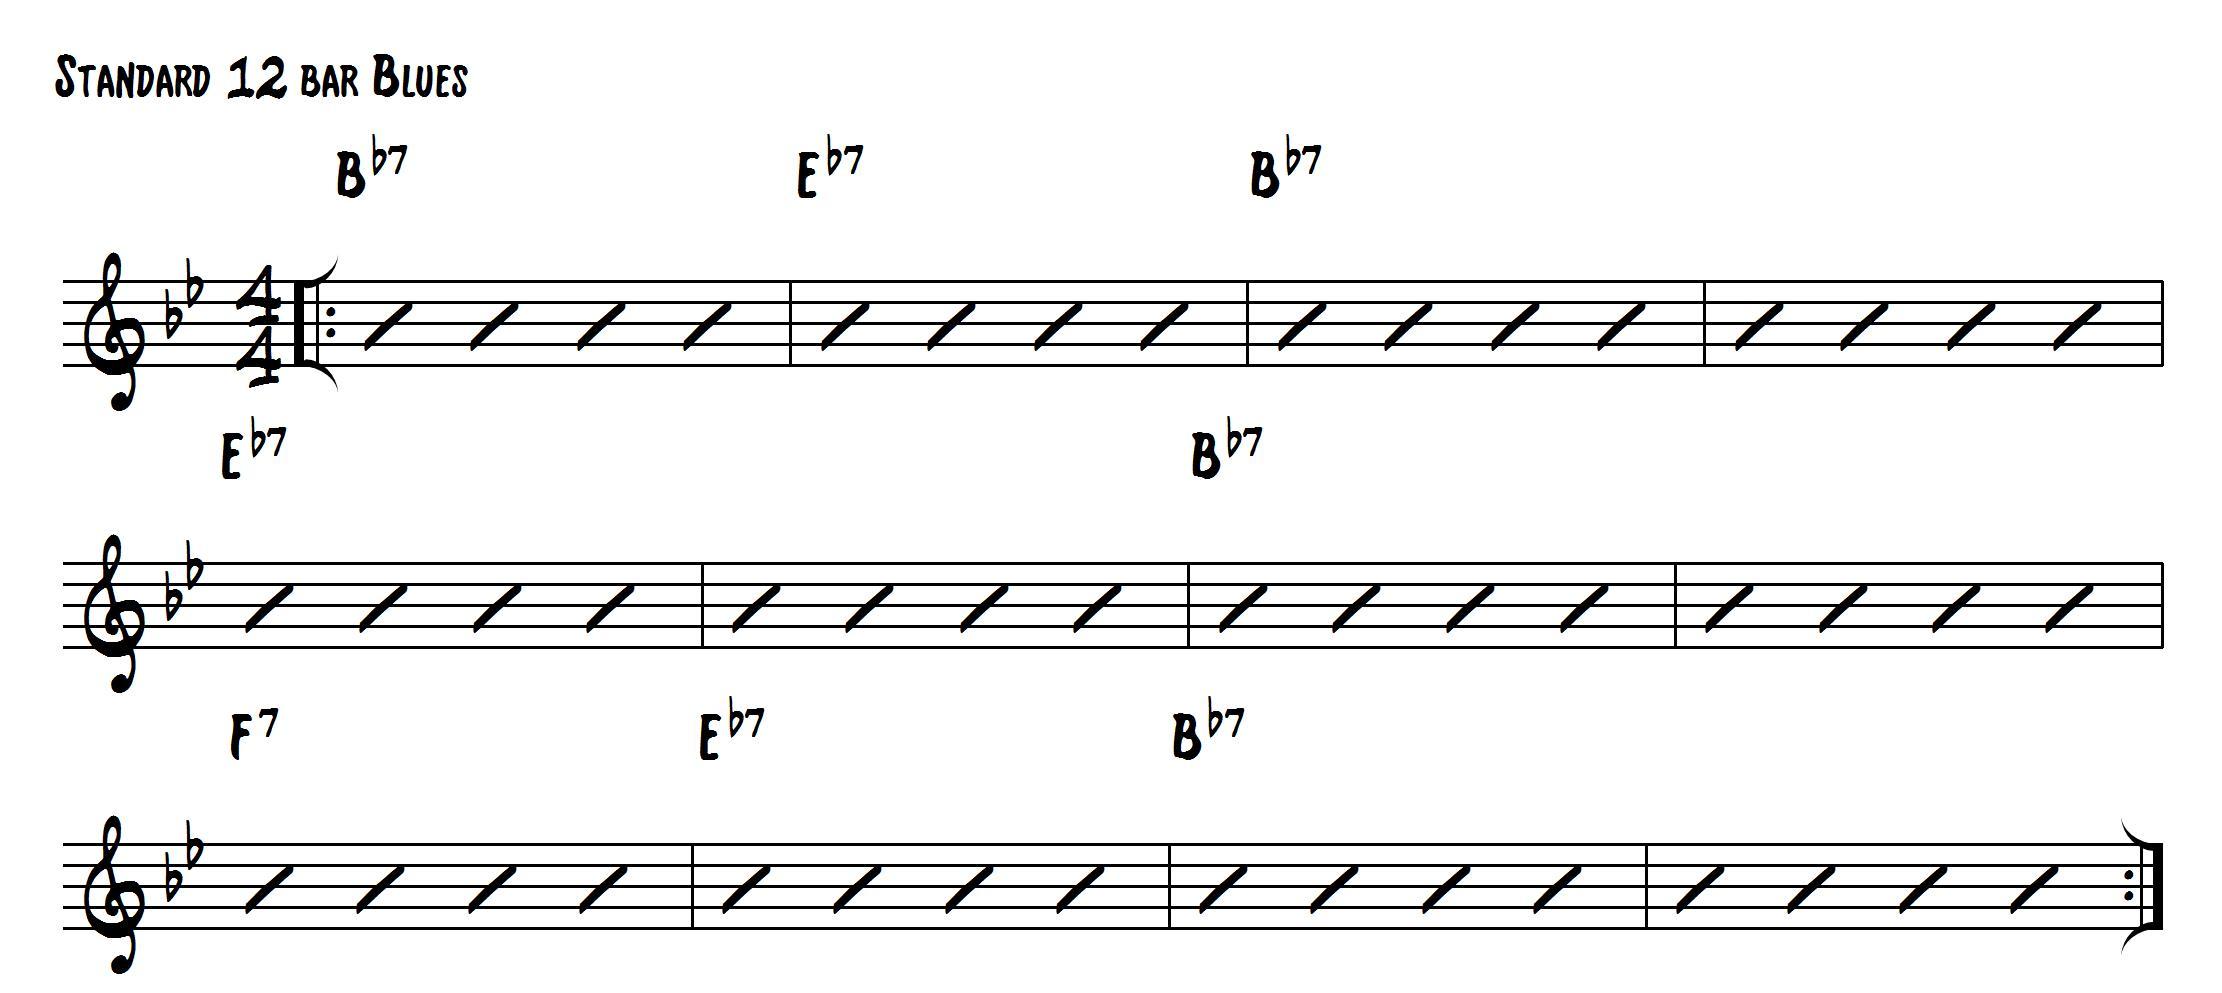 Standard 12 bar blues